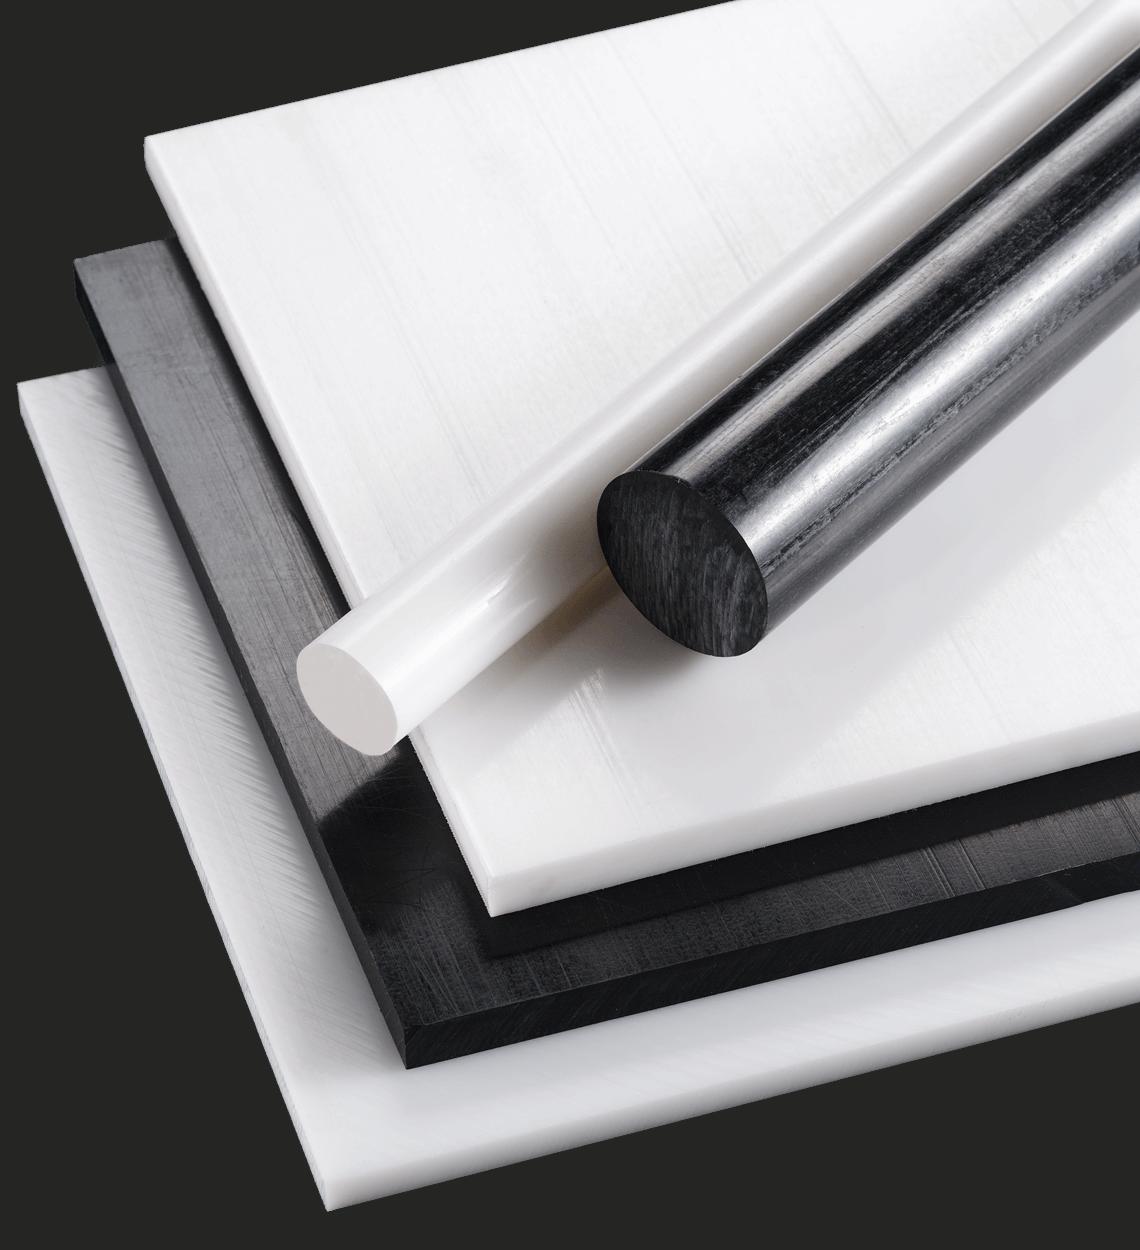 image free polymer sheet material